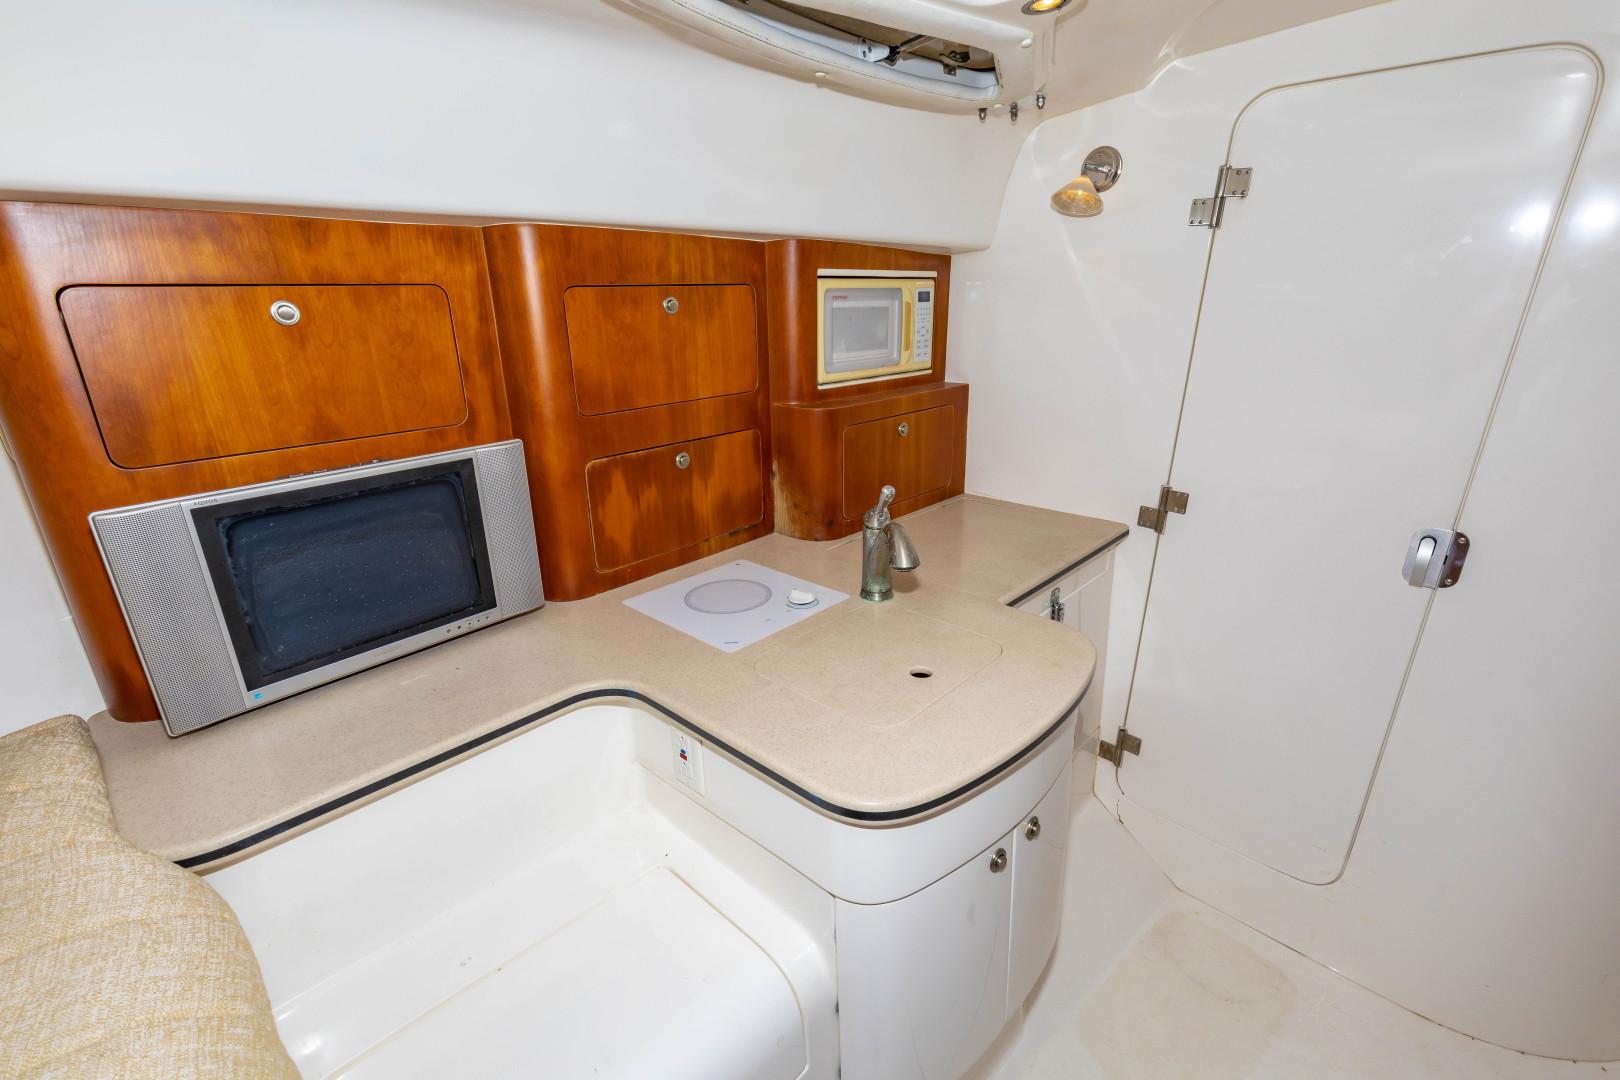 Intrepid-377 Walkaround 2005-Rock Boat REFIT 2018 Dania Beach-Florida-United States-377 Intrepid Galley 1-1511541 | Thumbnail